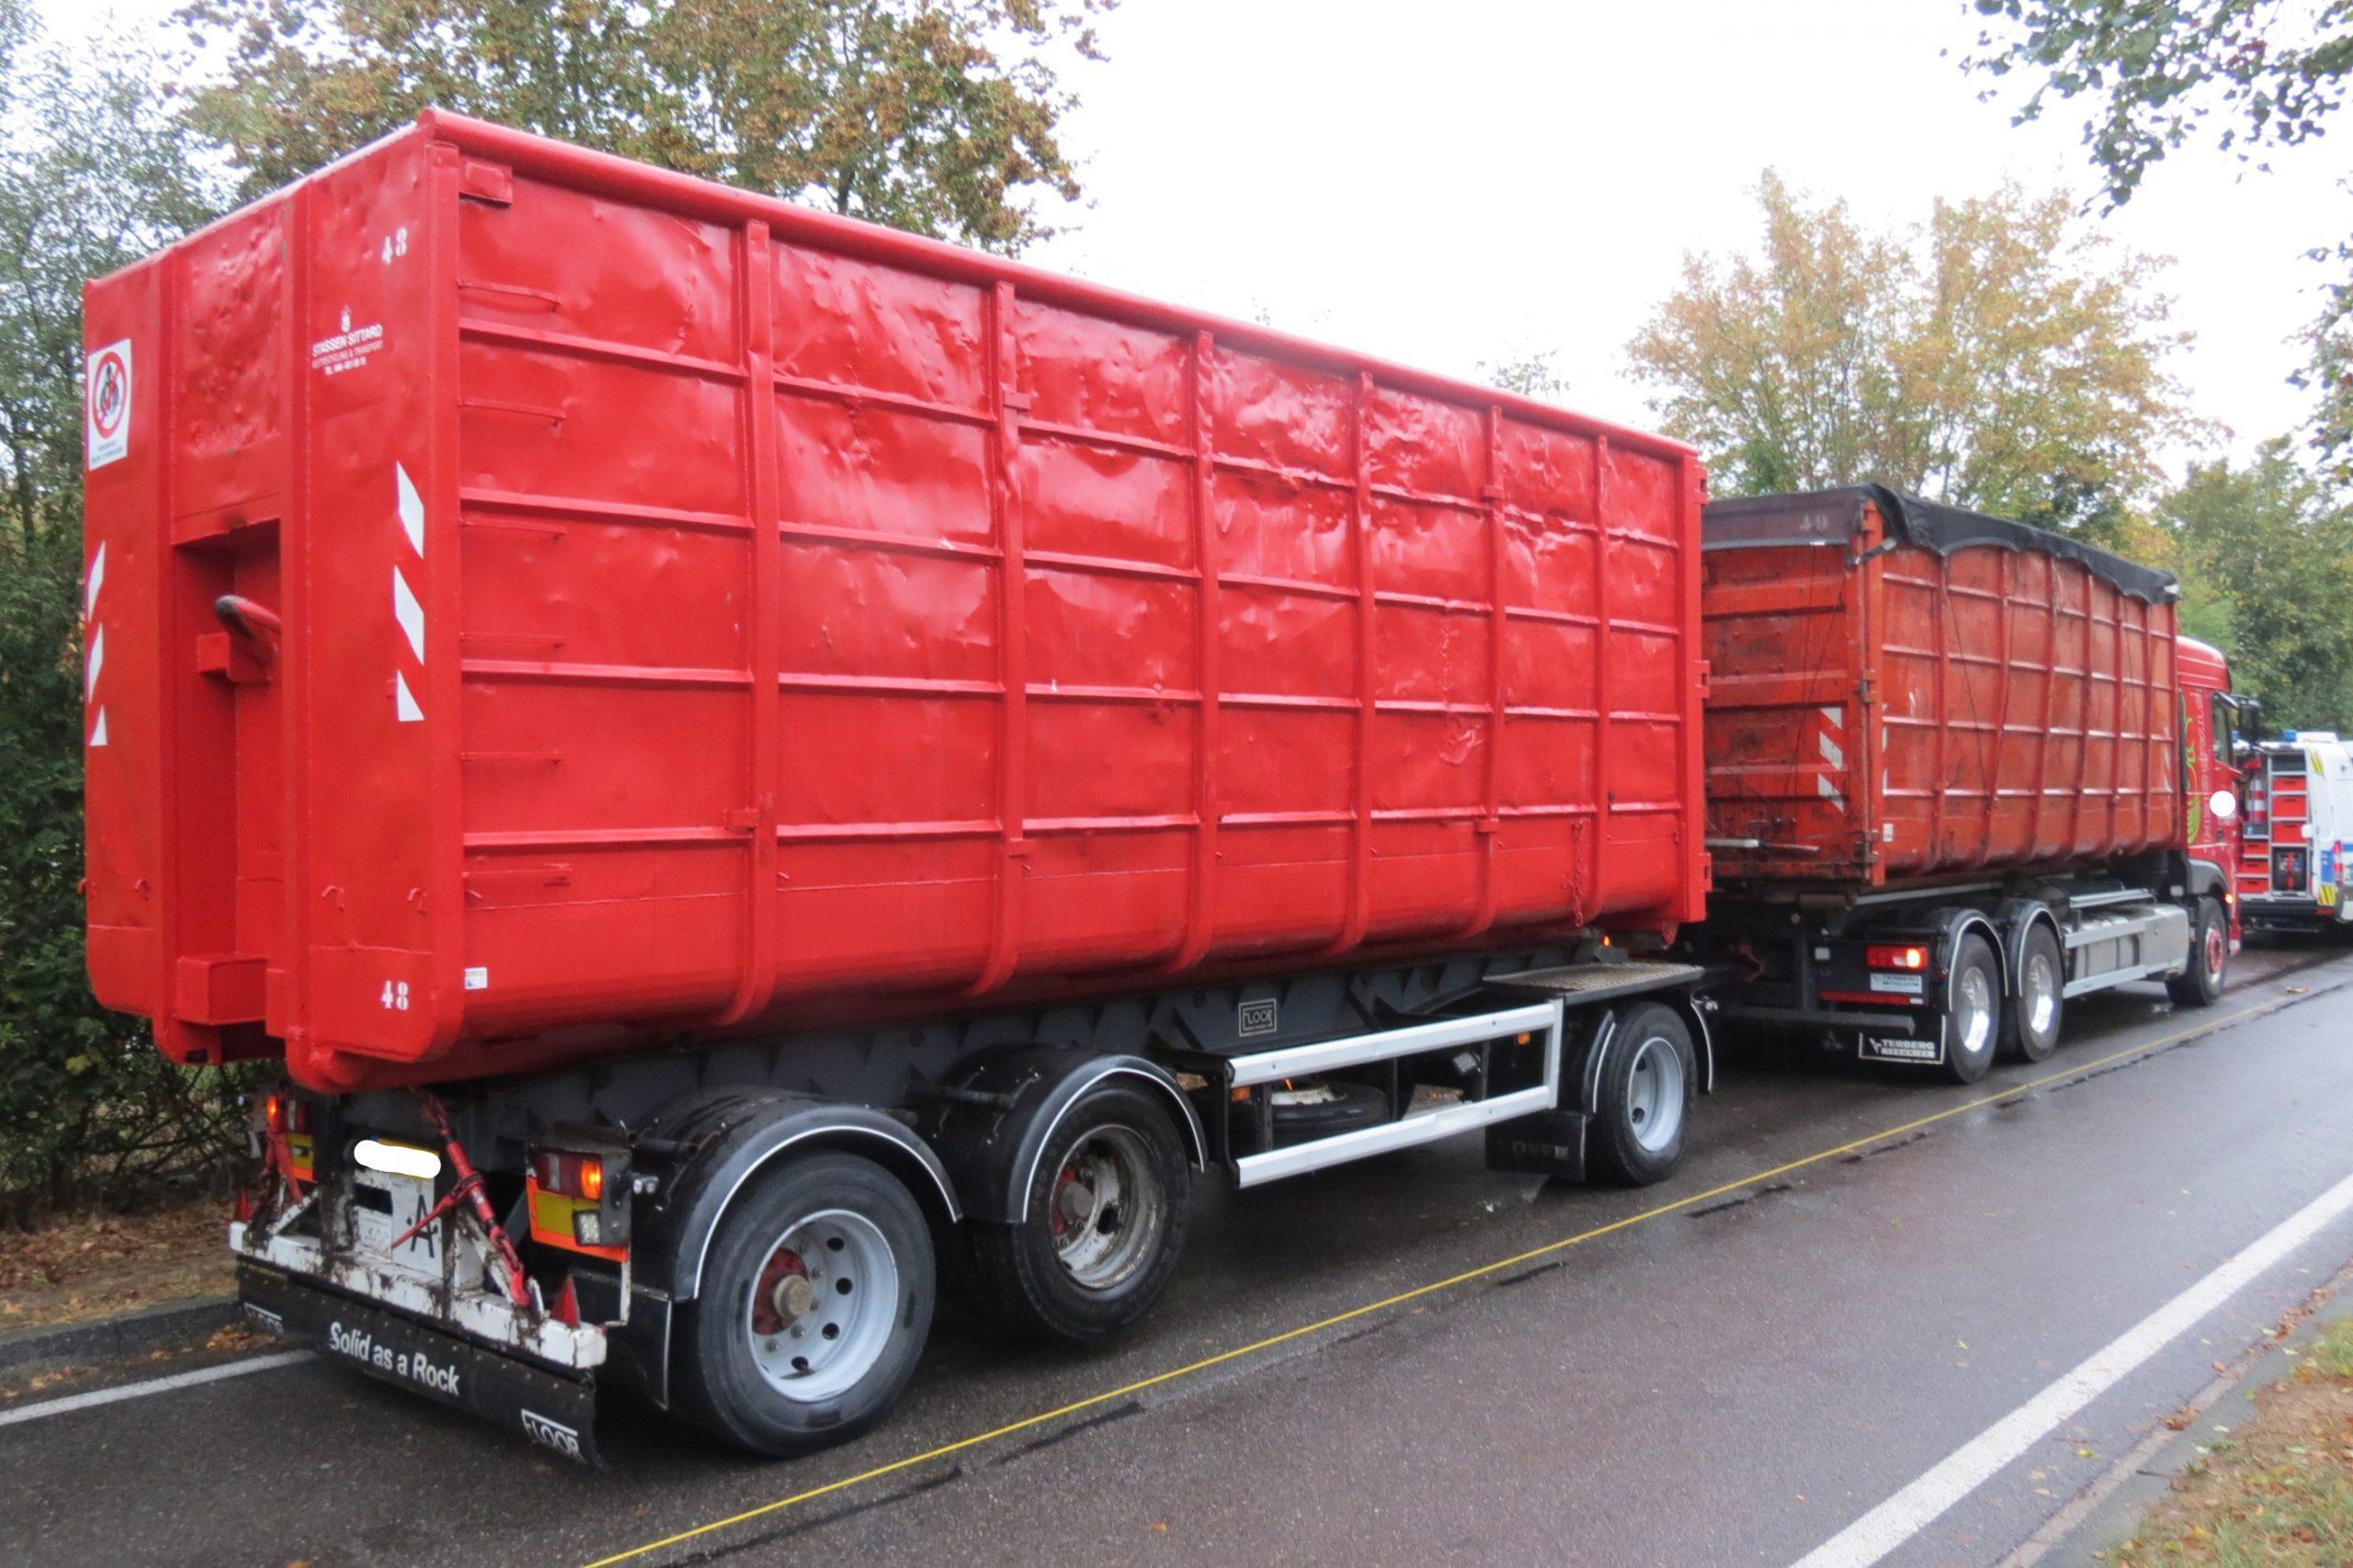 Acțiuni de control a camioanelor în zona Wittlich (Renania-Palatinat)